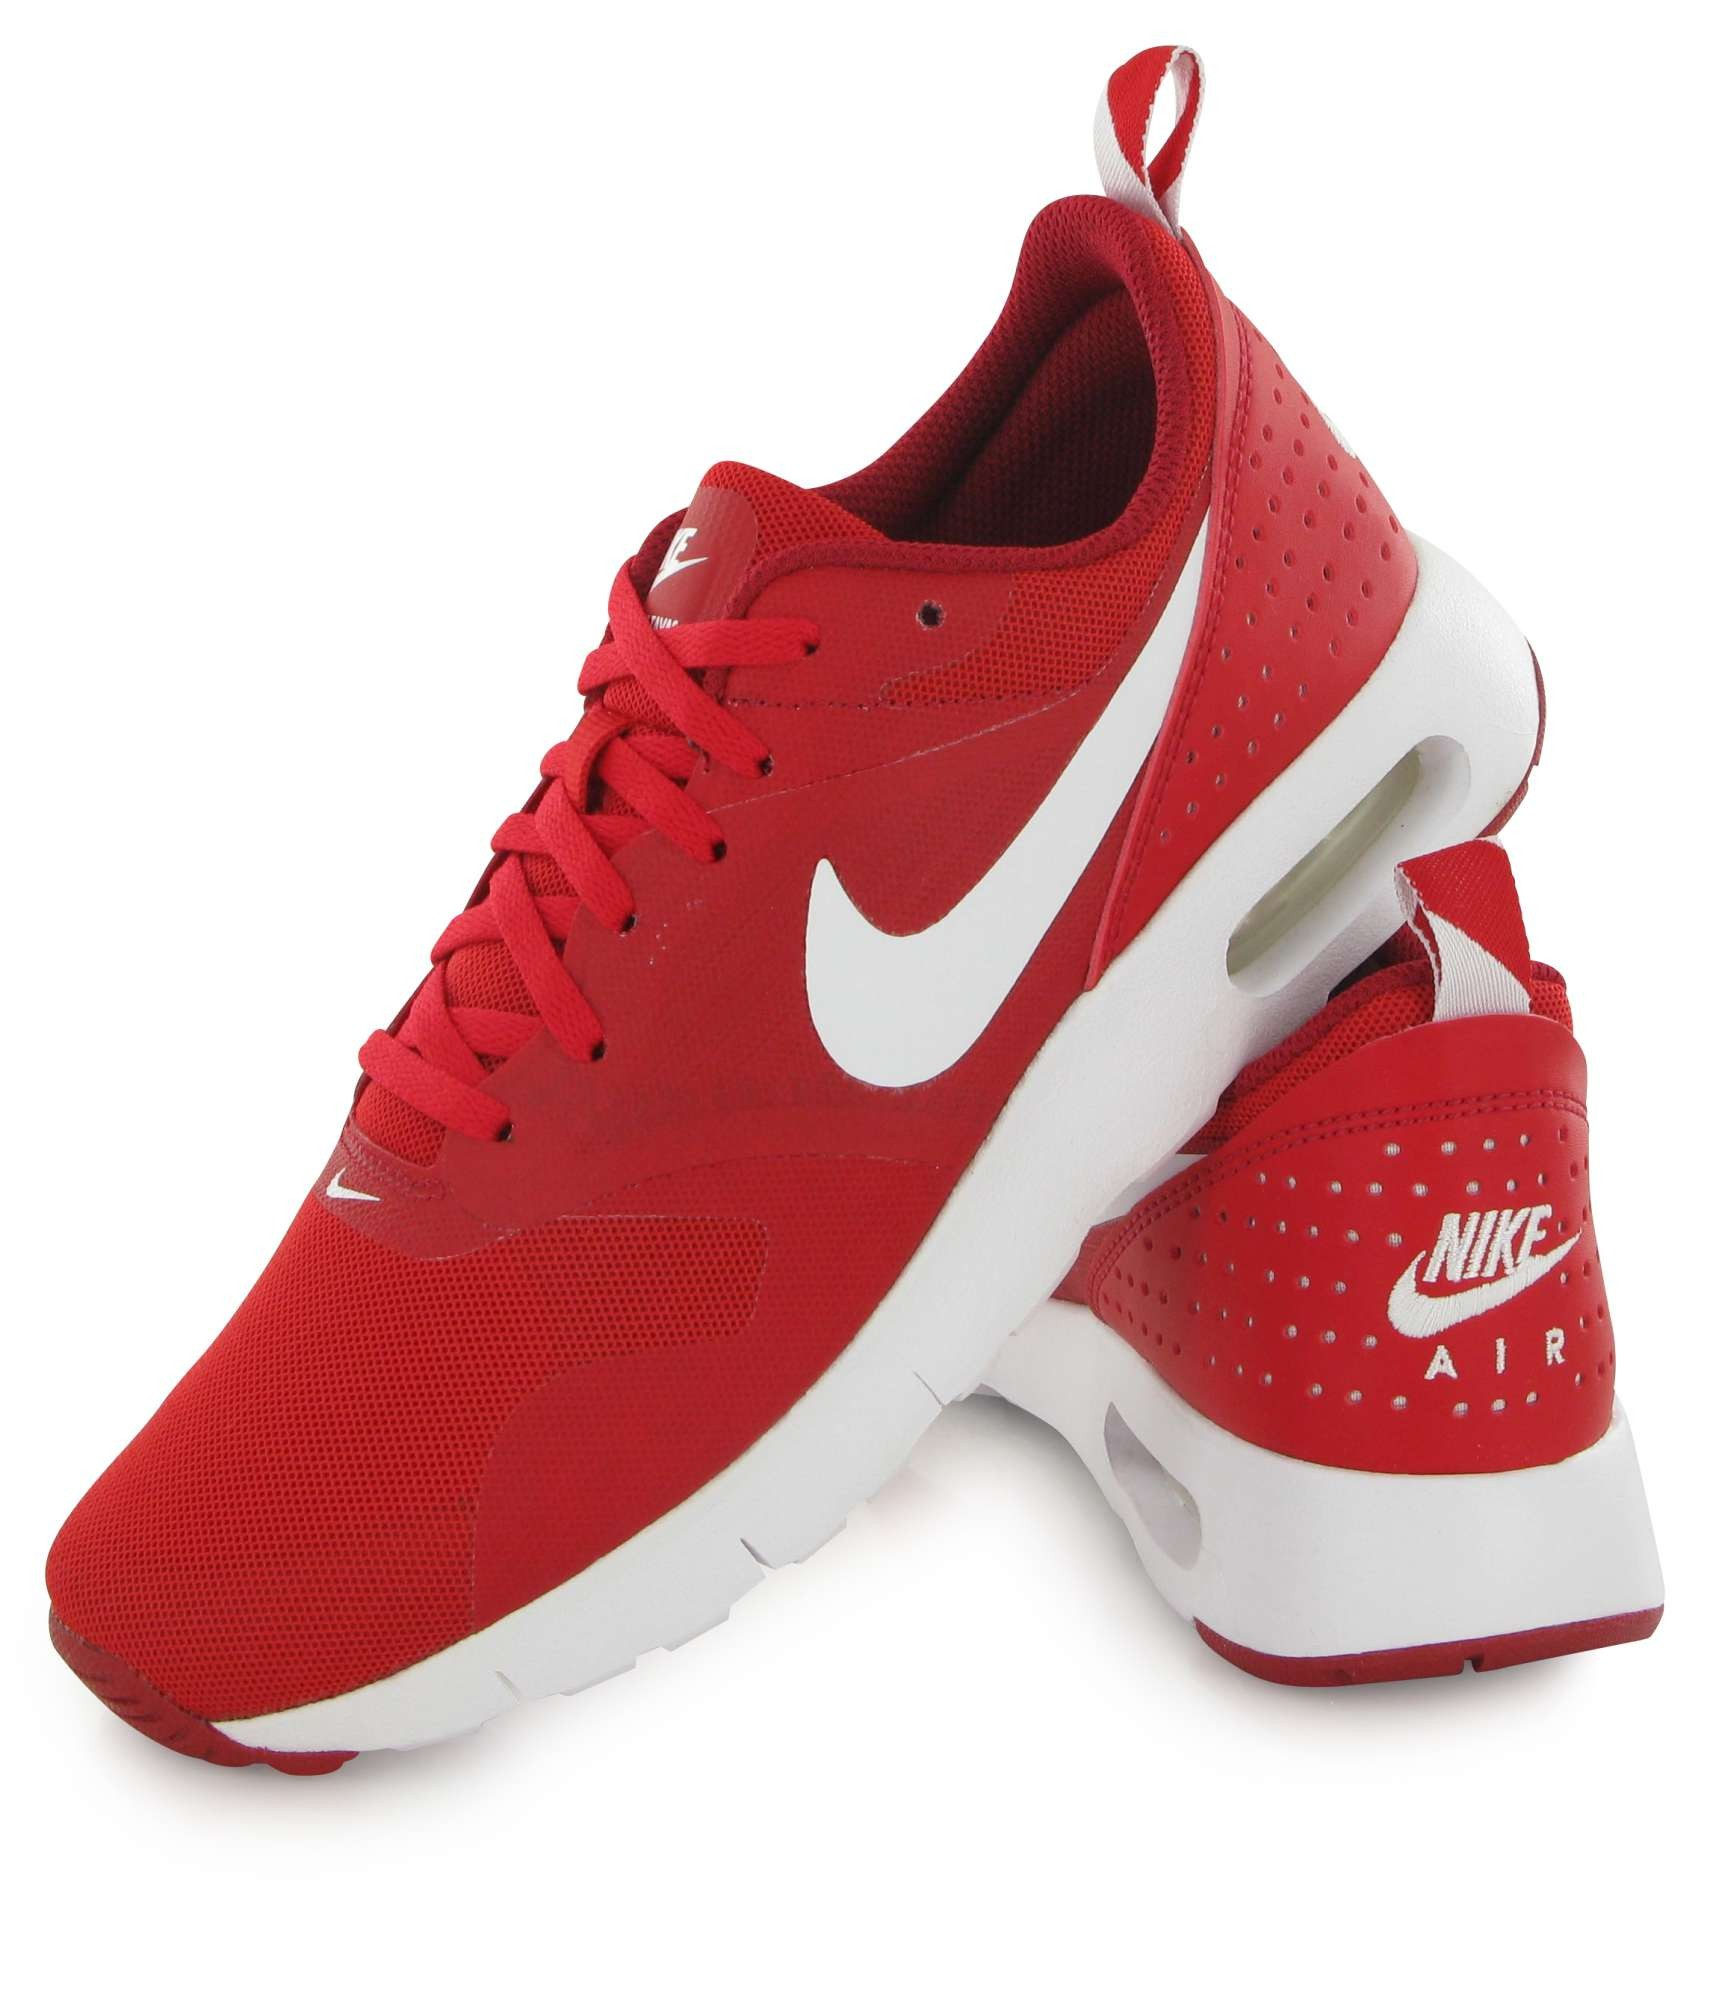 new style 01465 1b621 ... discount grandelection nike air max tavas pas femme chaussures pas  tavas cher alainhemet aabdf8 a6442 70842